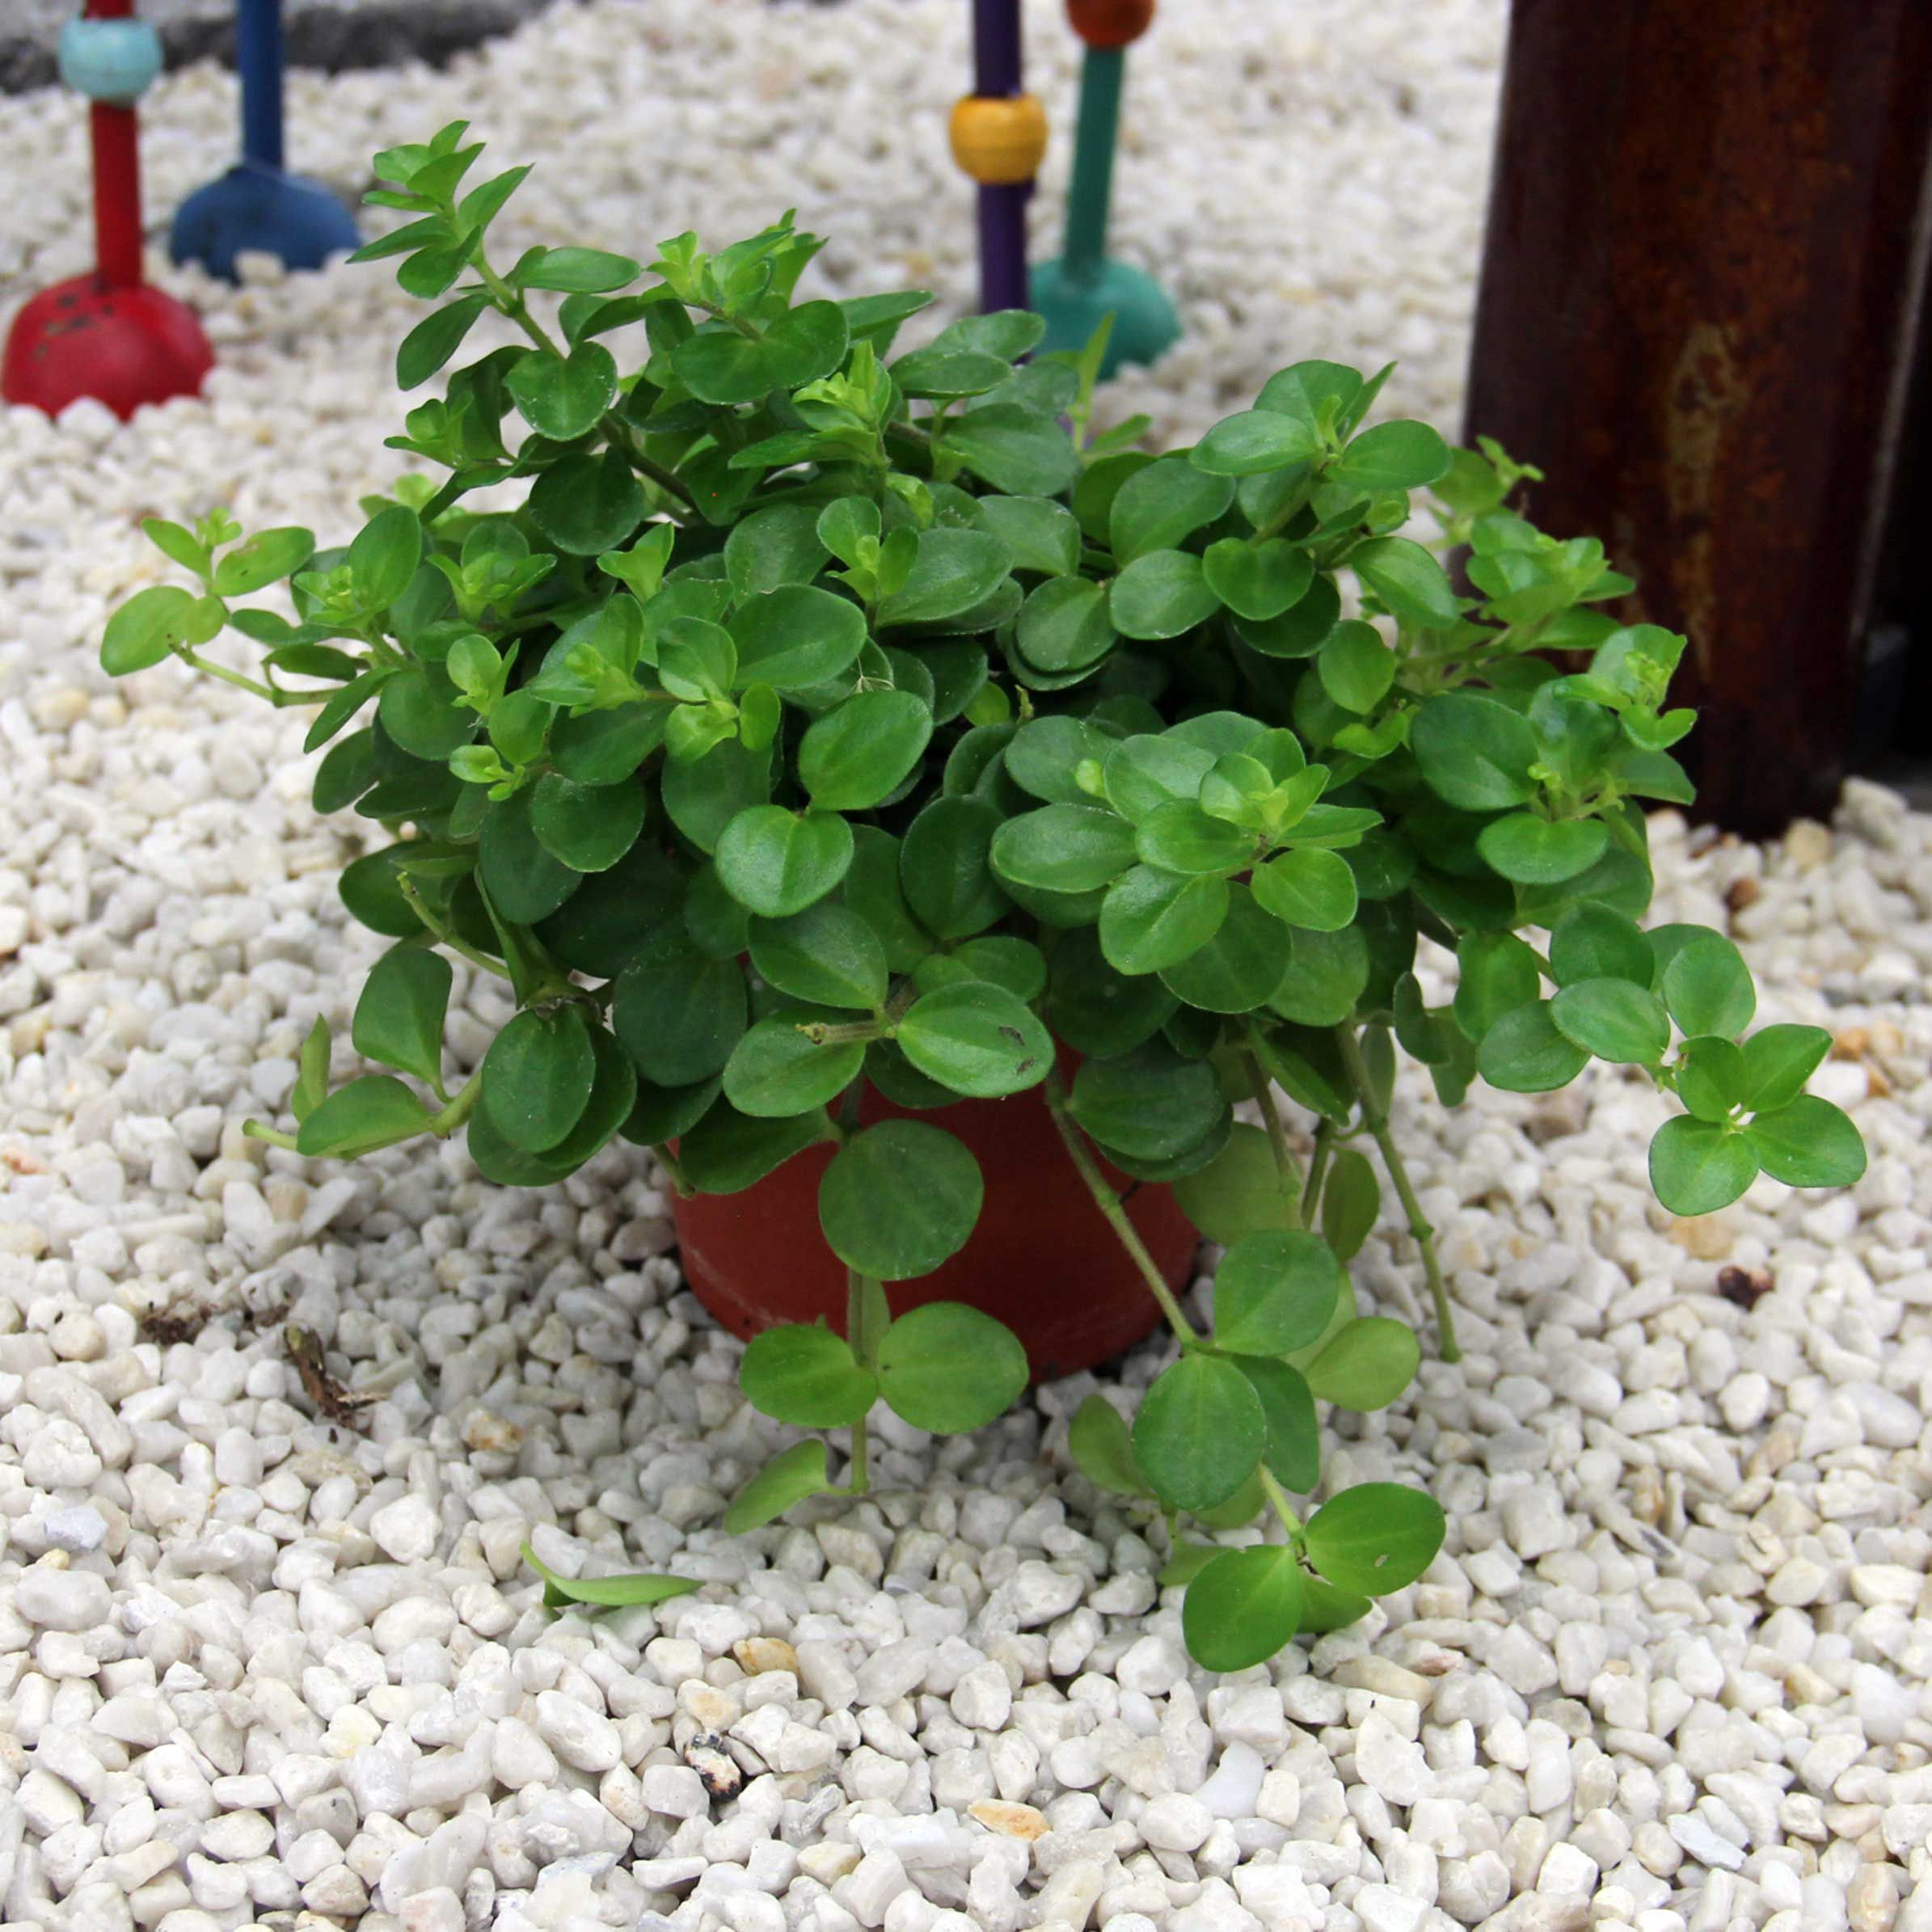 diese zwergpfeffer-art hat grüne, eiförmige, kurzgestielte blätter, Gartengerate ideen